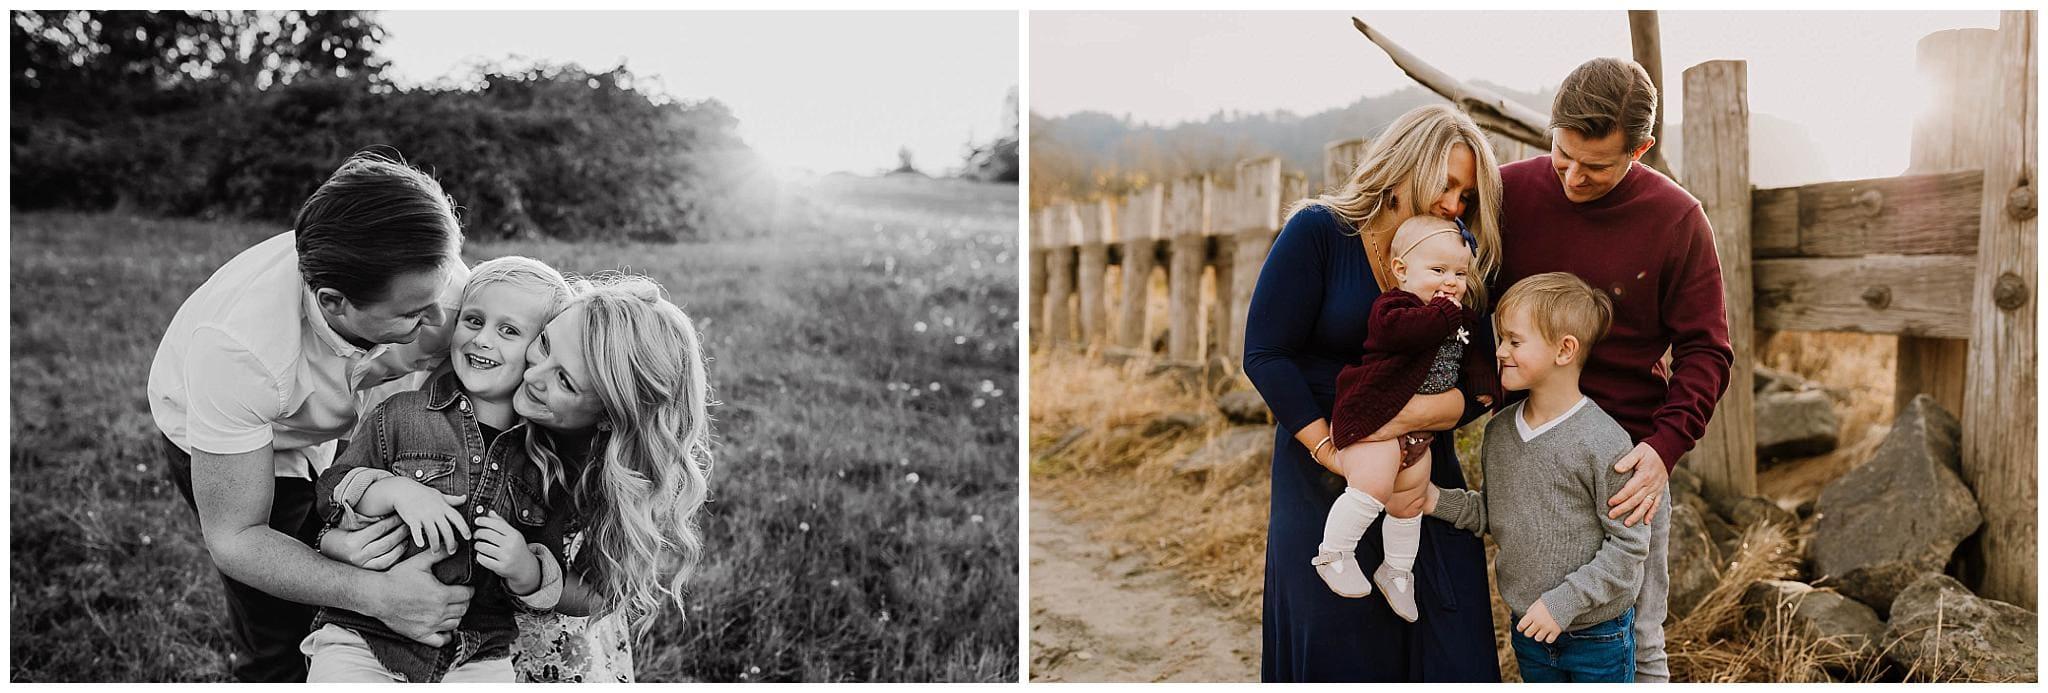 two photos of a portland family taken a year apart